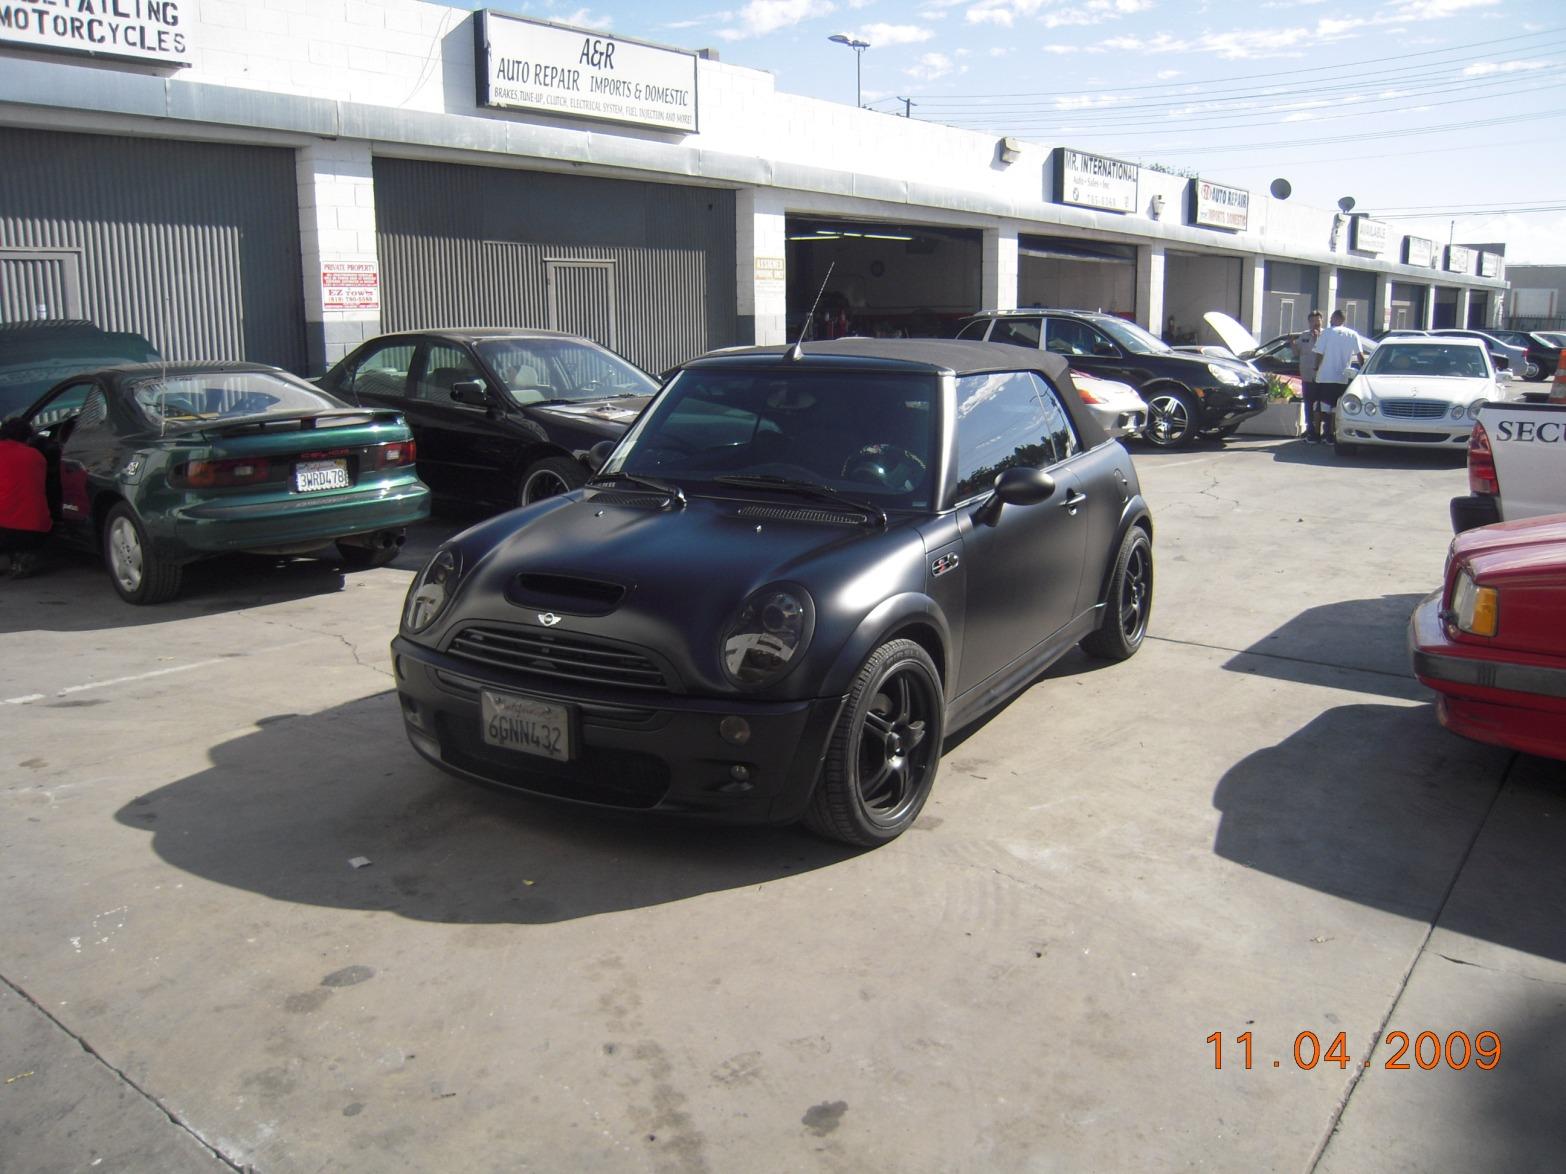 west-coast-body-and-paint-black-mini-cooper-matte-7